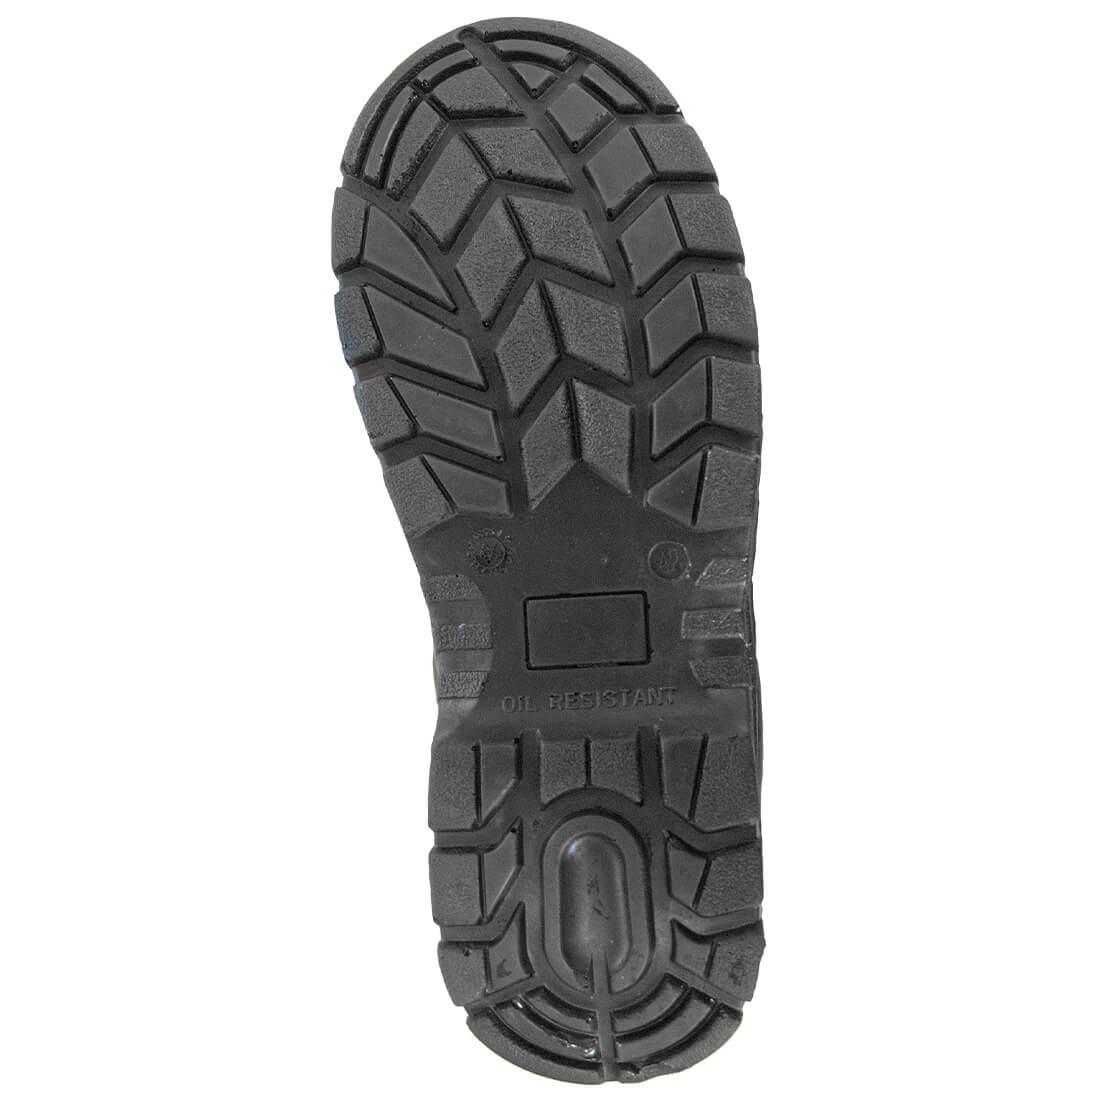 Pantof Thor S3 Compositelite™ - Incaltaminte de protectie